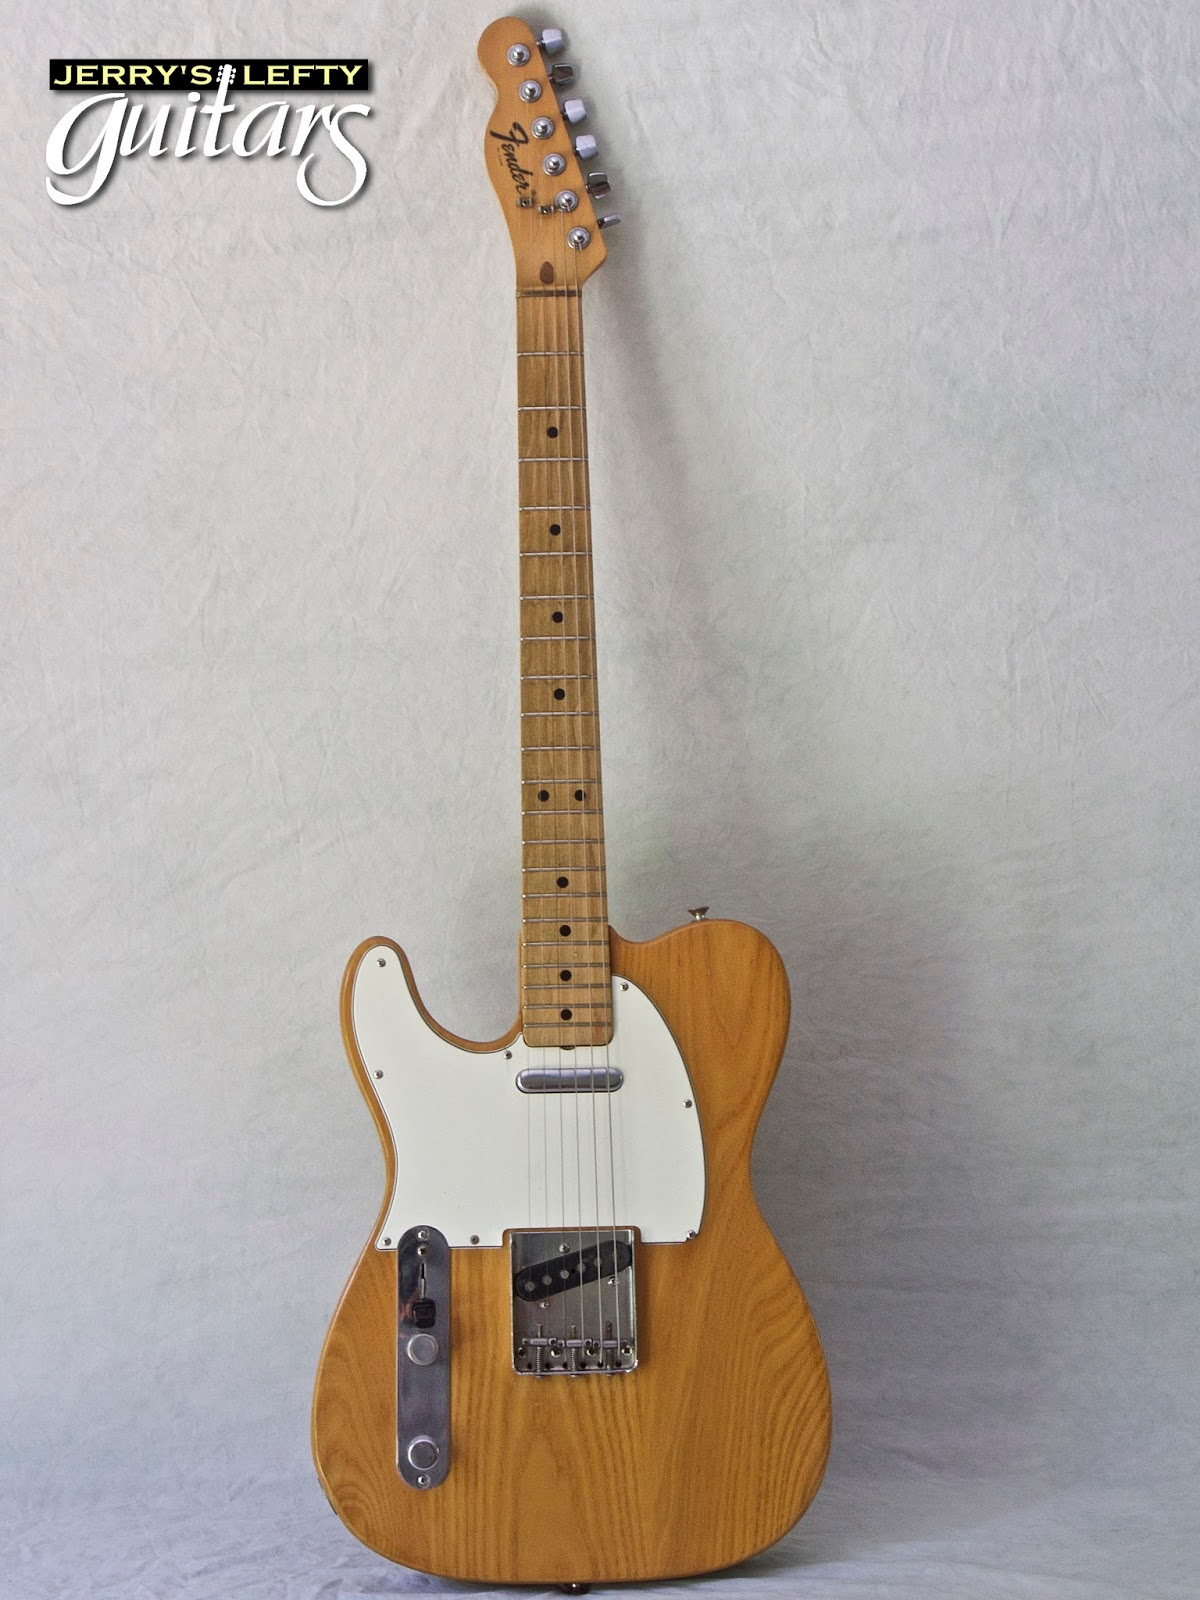 jerry 39 s lefty guitars newest guitar arrivals updated weekly 1975 fender telecaster natural. Black Bedroom Furniture Sets. Home Design Ideas